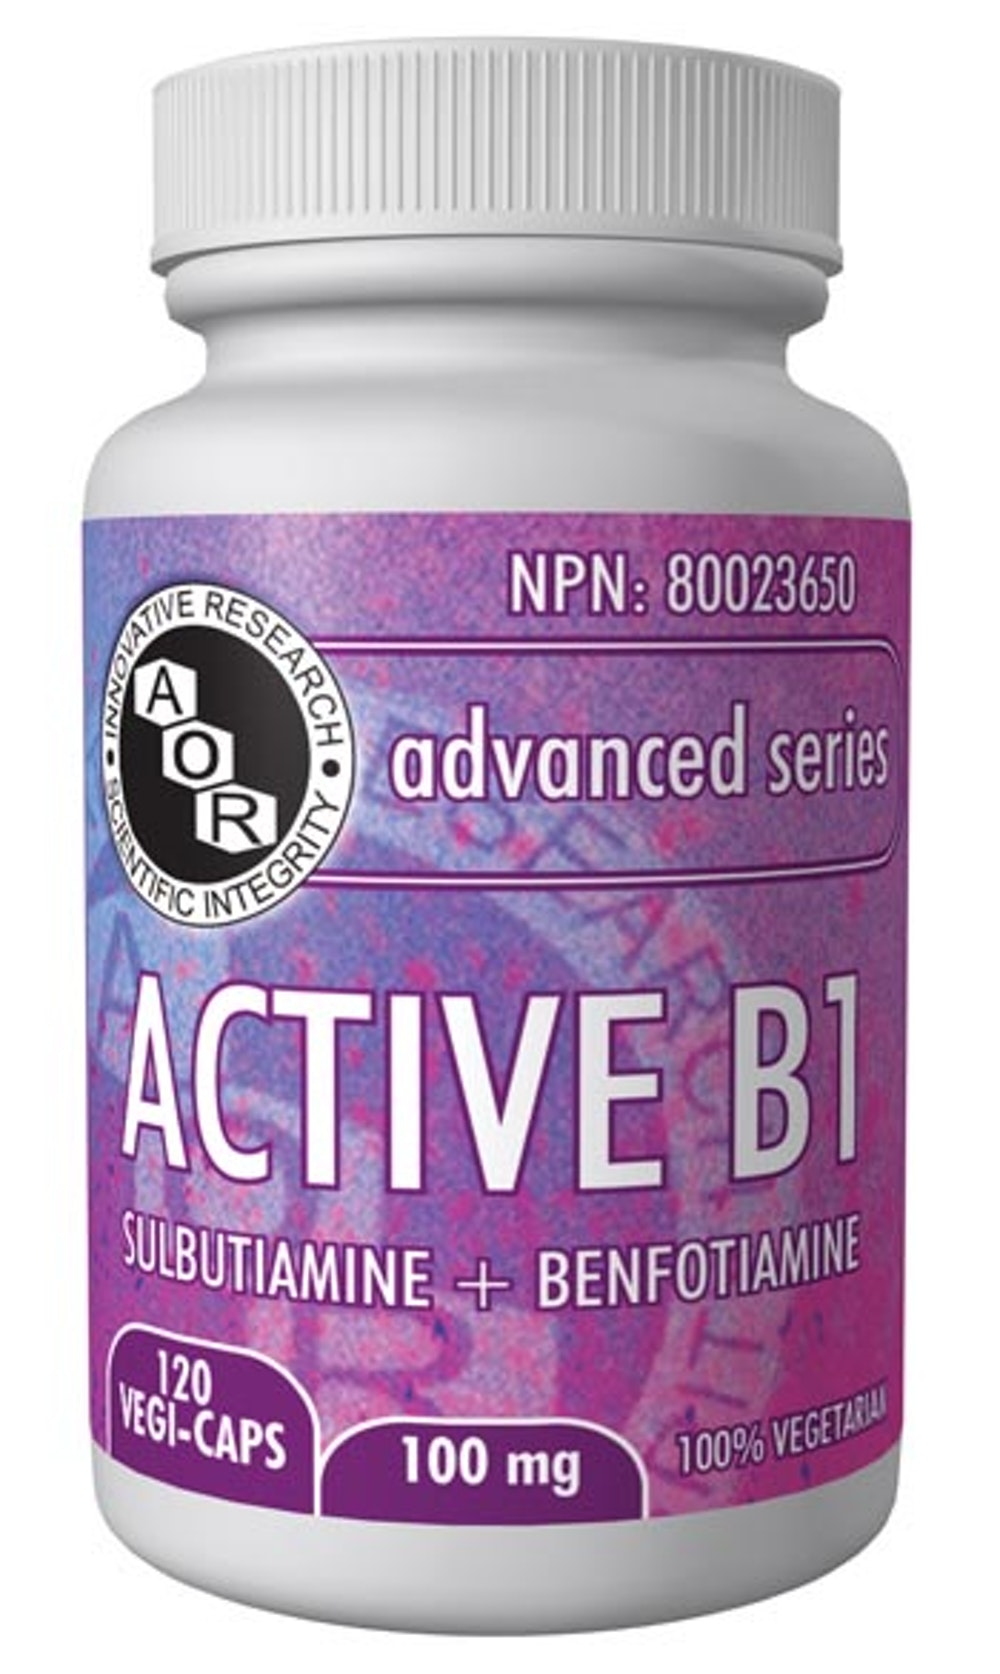 Active B1